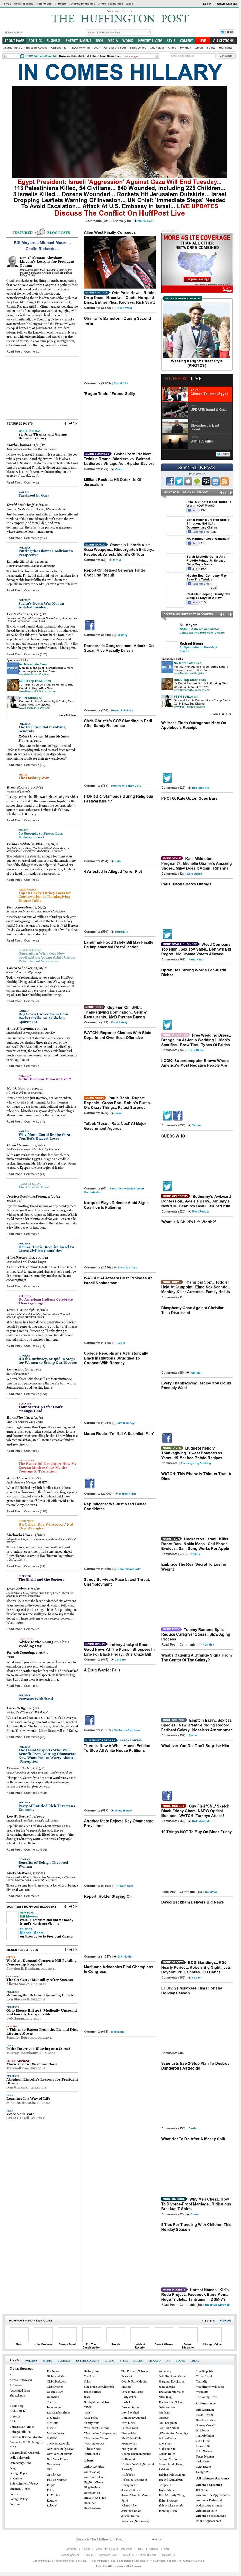 The Huffington Post at Tuesday Nov. 20, 2012, 3:12 p.m. UTC